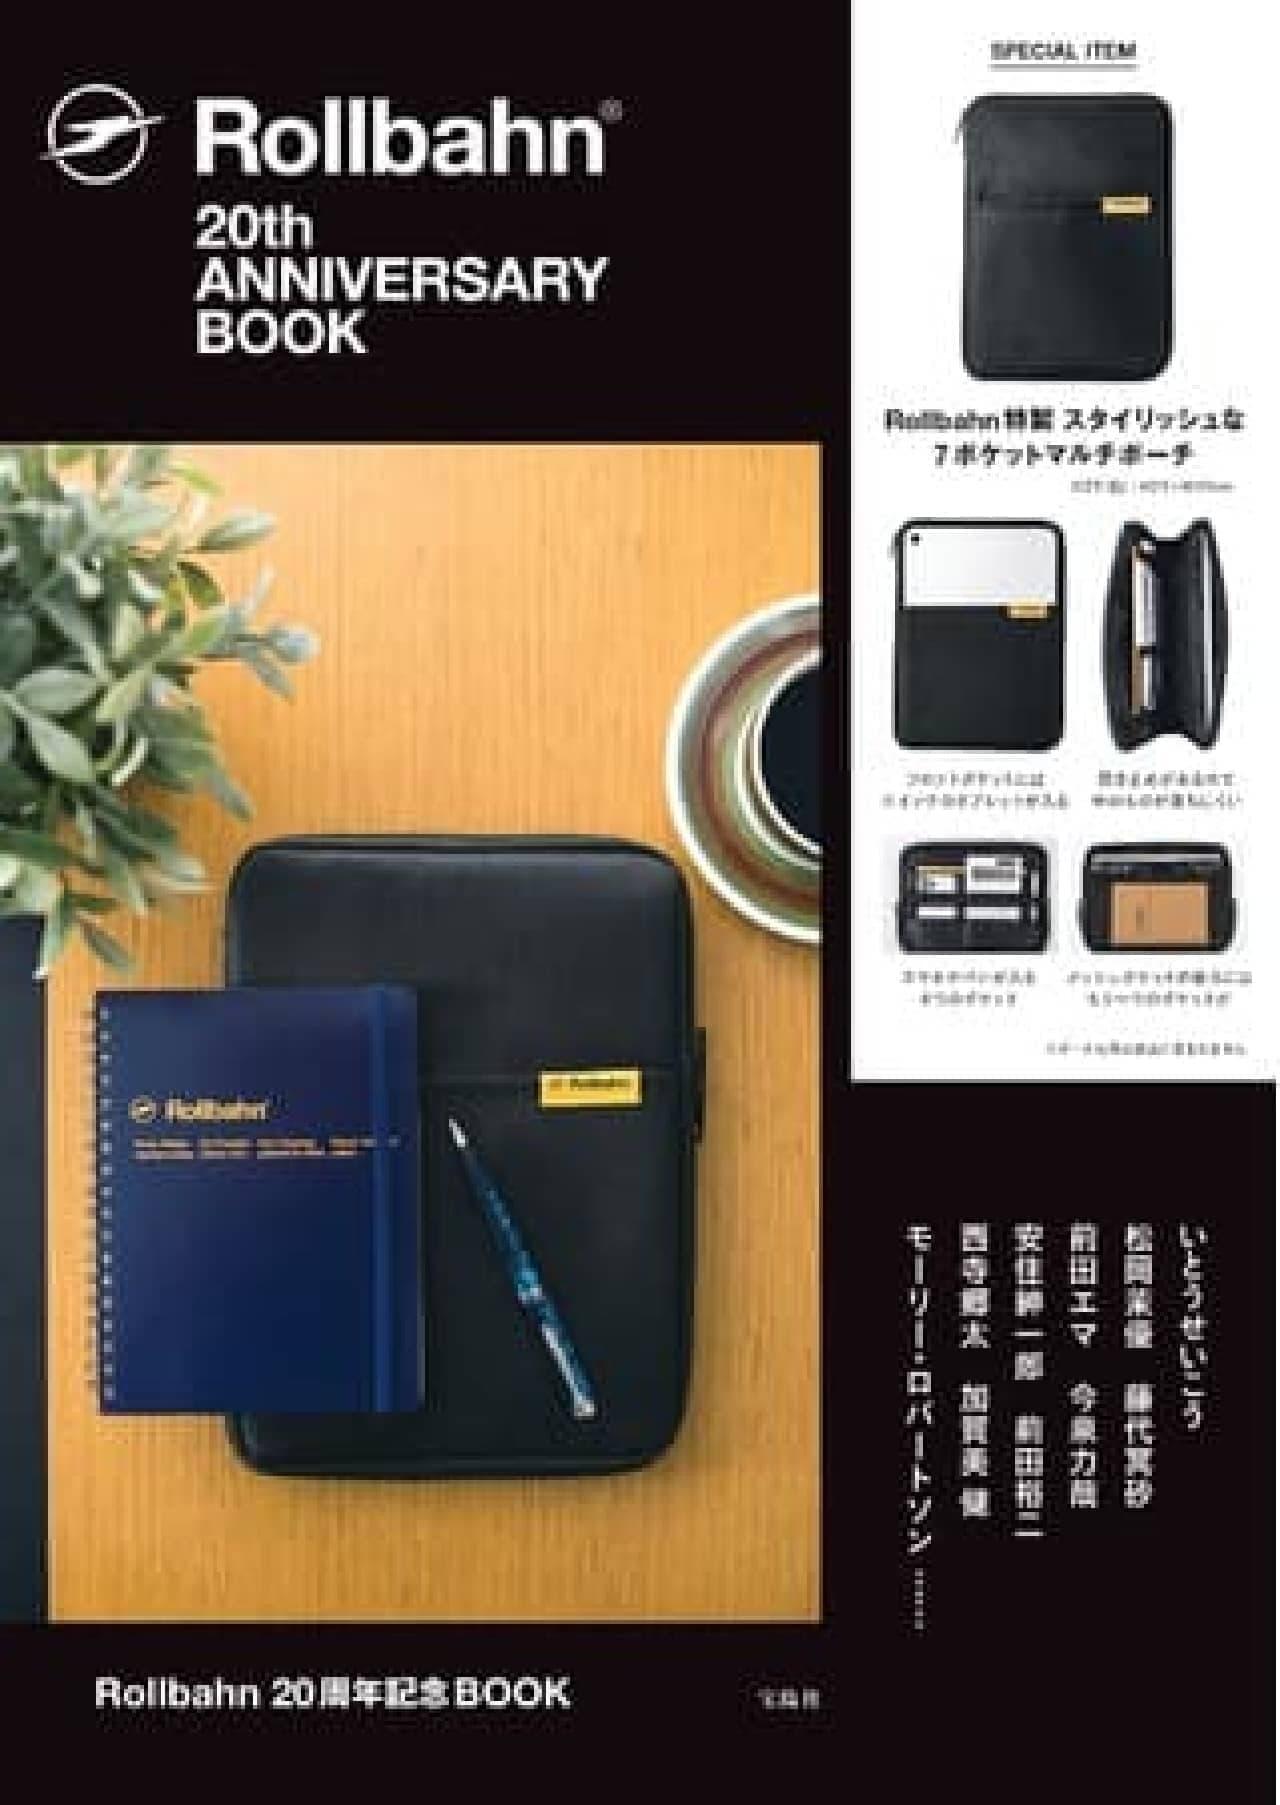 「Rollbahn 20th ANNIVERSARY BOOK」登場 -- マルチポーチ付きのブランドブック